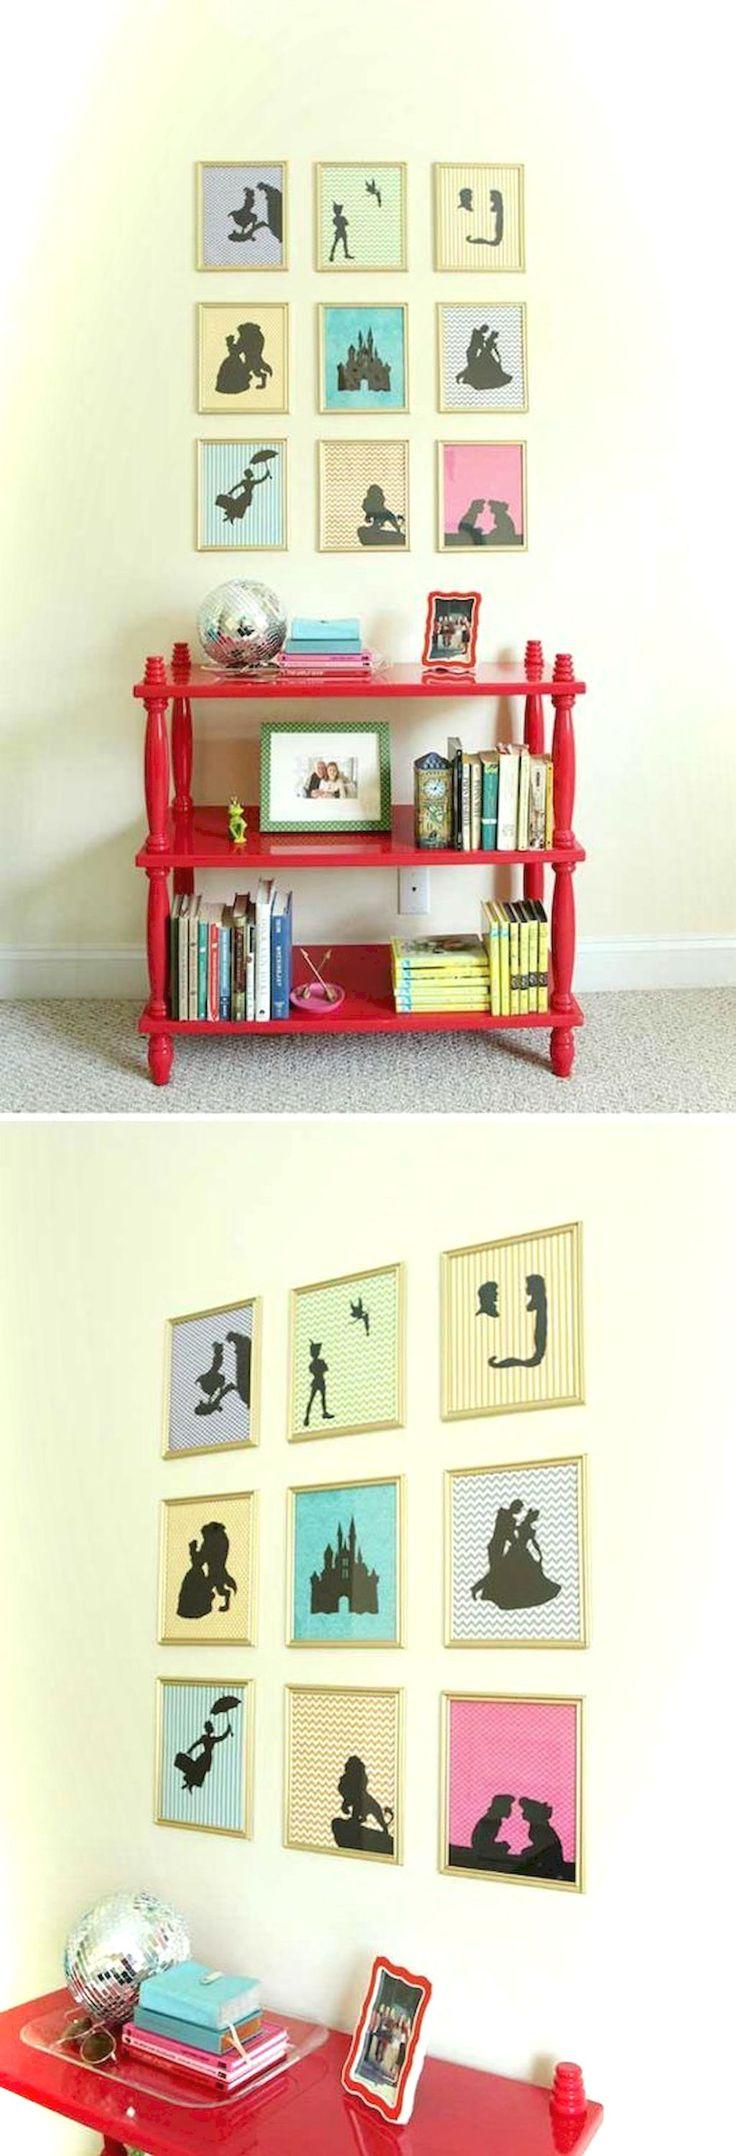 Adorable 40 Cute Craft Ideas for Teen Girl Bedroom https://decorisart.com/28/40-cute-craft-ideas-teen-girl-bedroom/